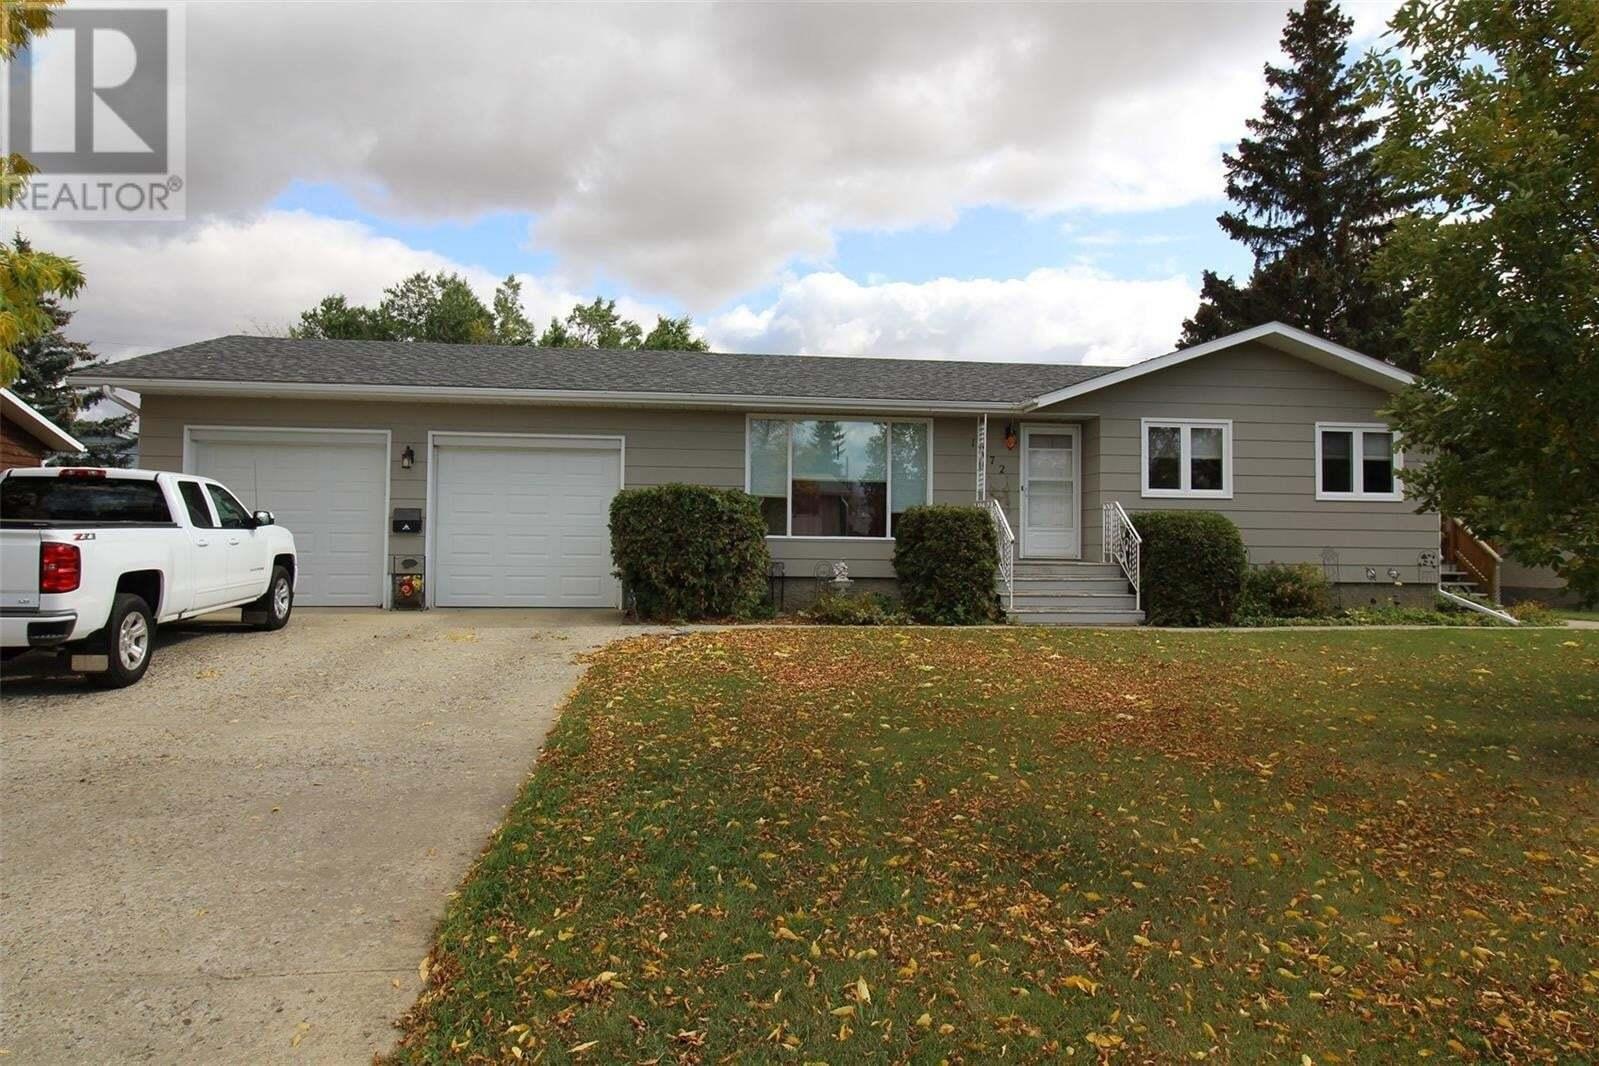 House for sale at 1272 111th St North Battleford Saskatchewan - MLS: SK813298